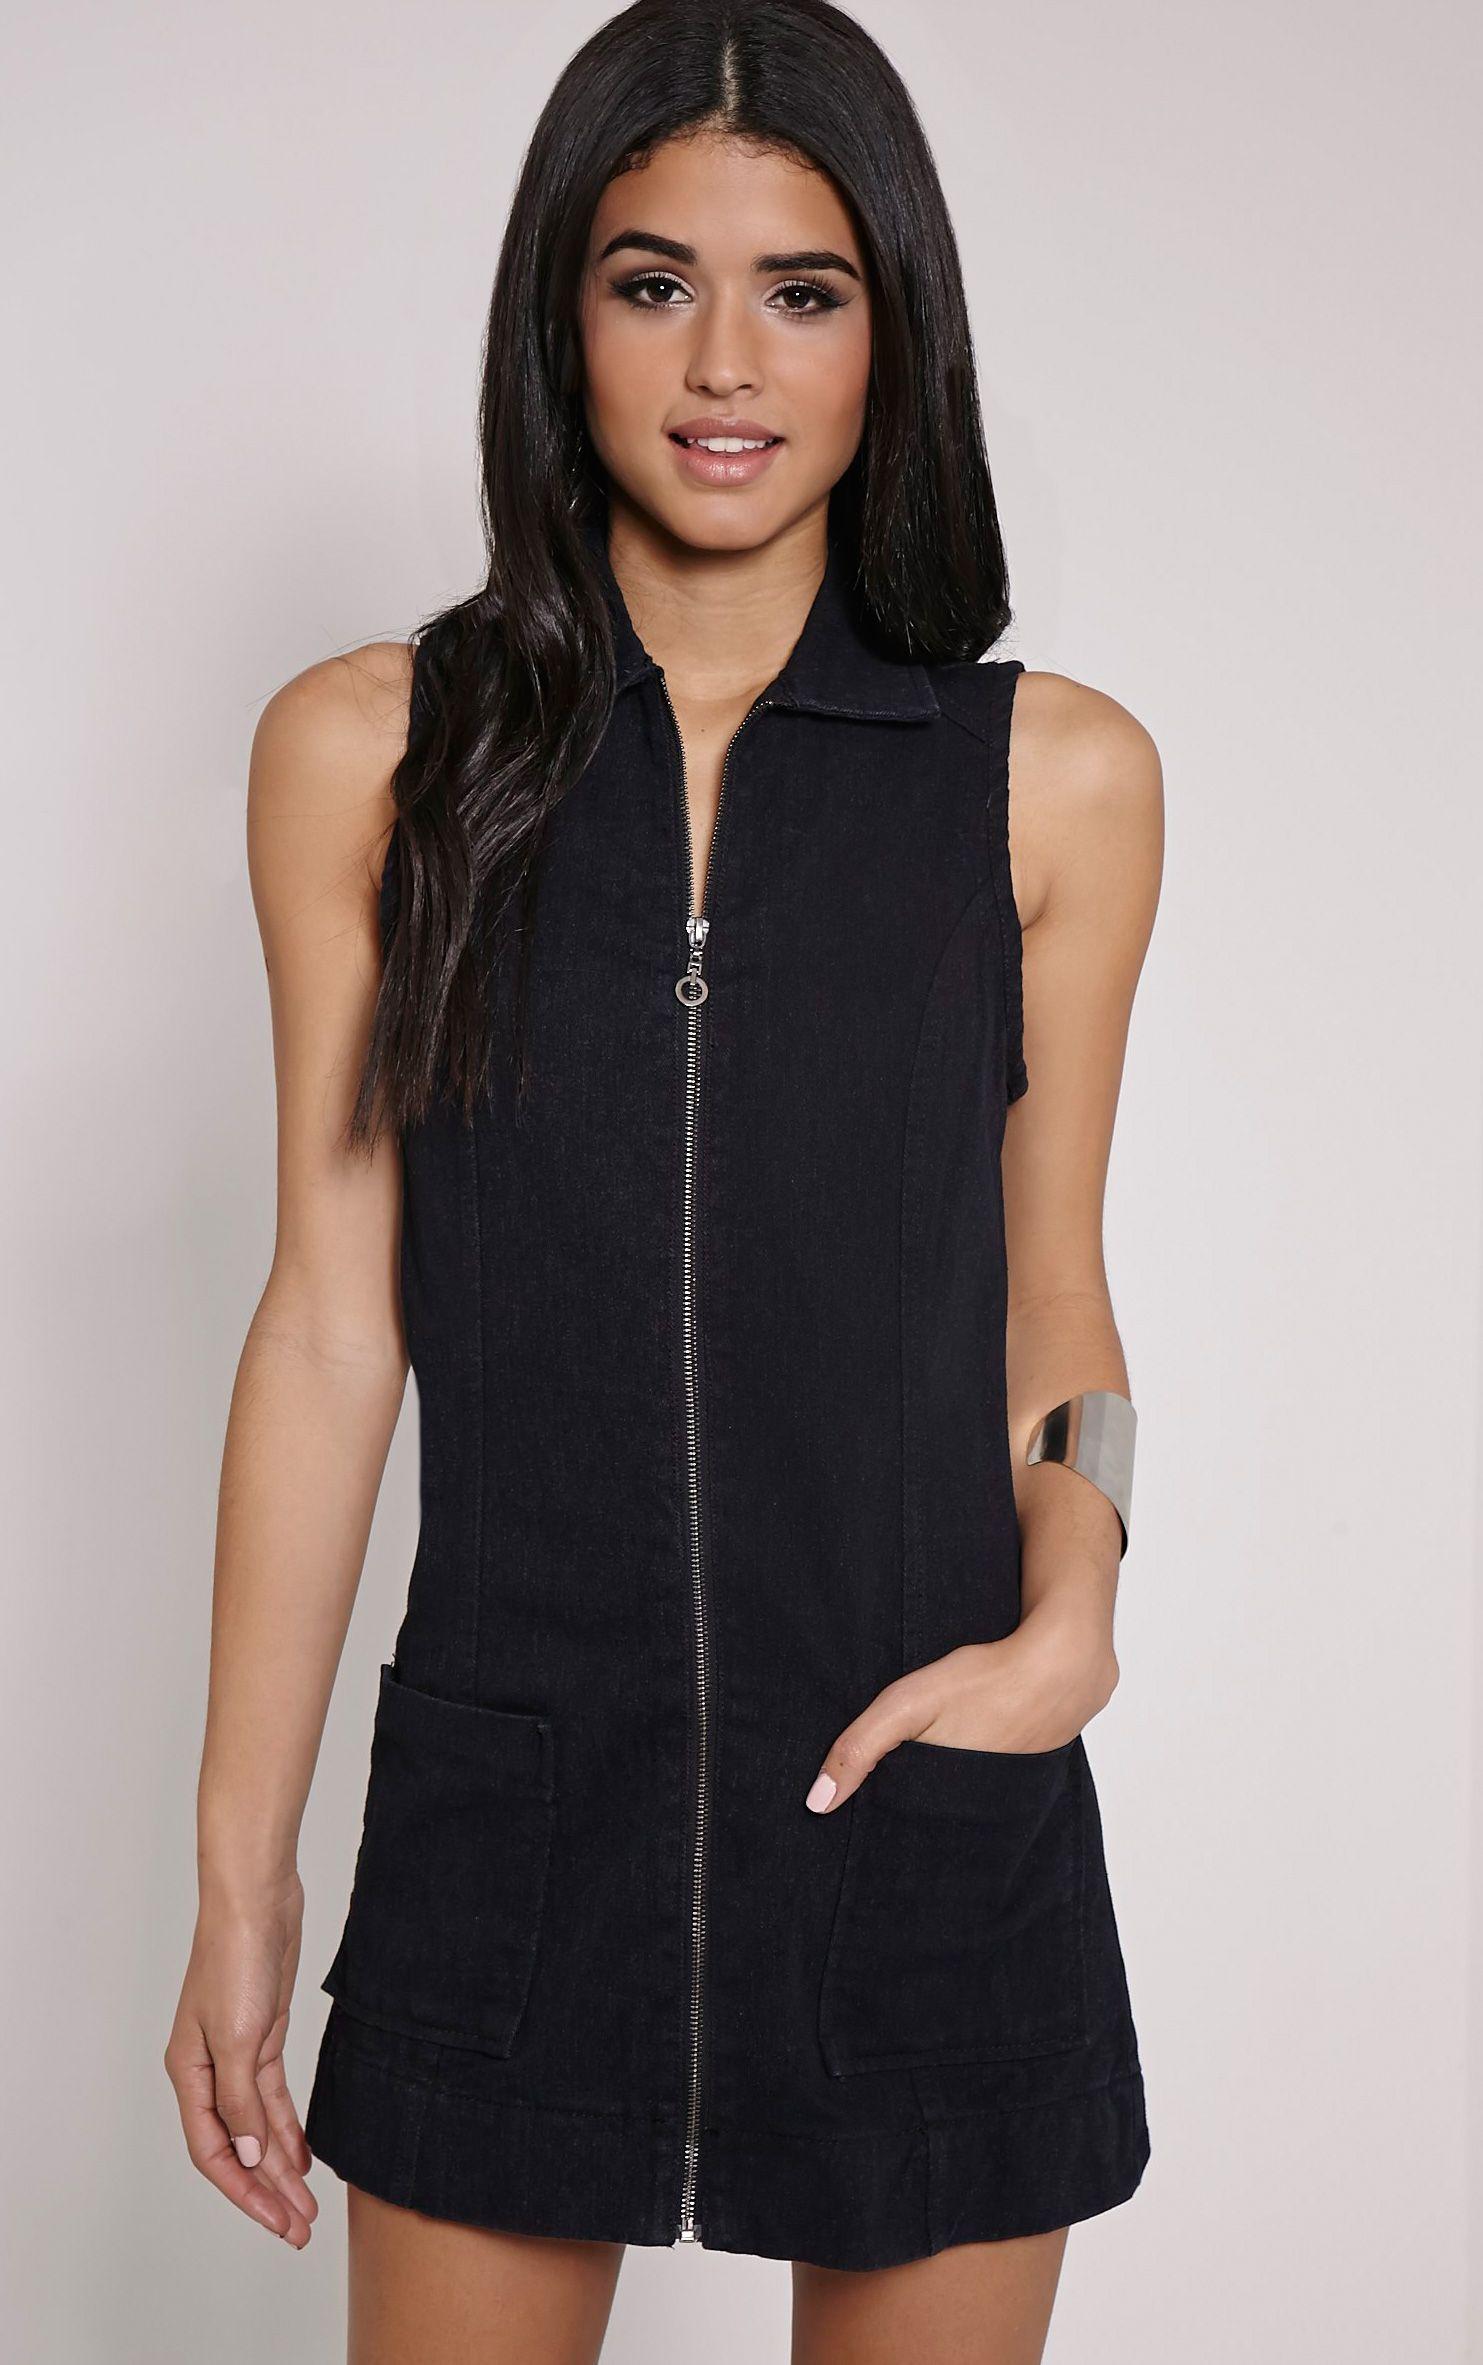 Moxie Black Zip Front Denim Dress 1